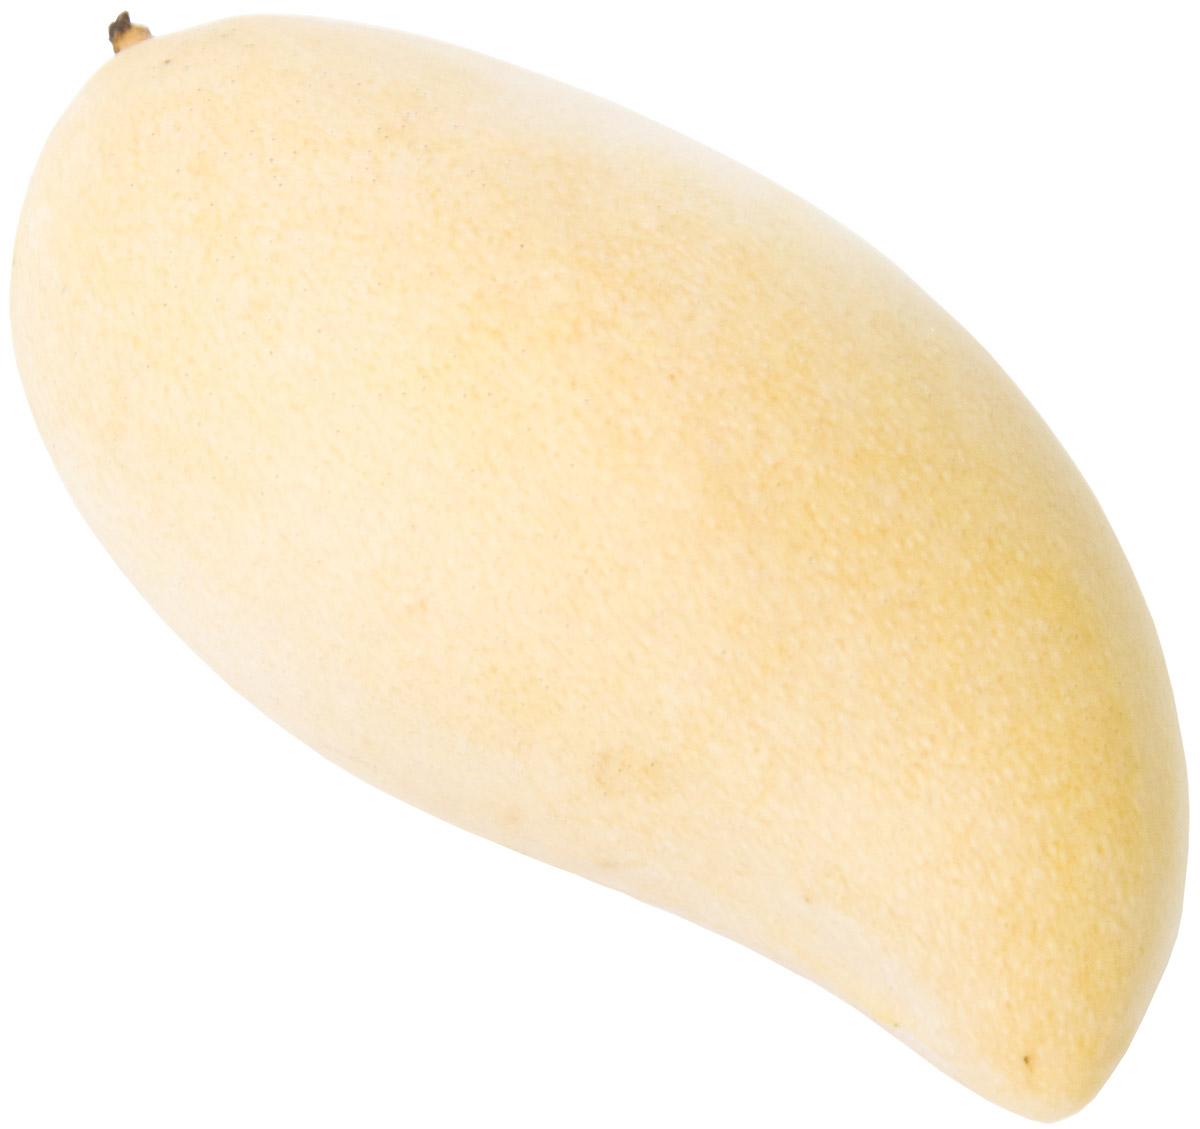 Манго желтое, 1 шт манго производство таиланд 1 шт